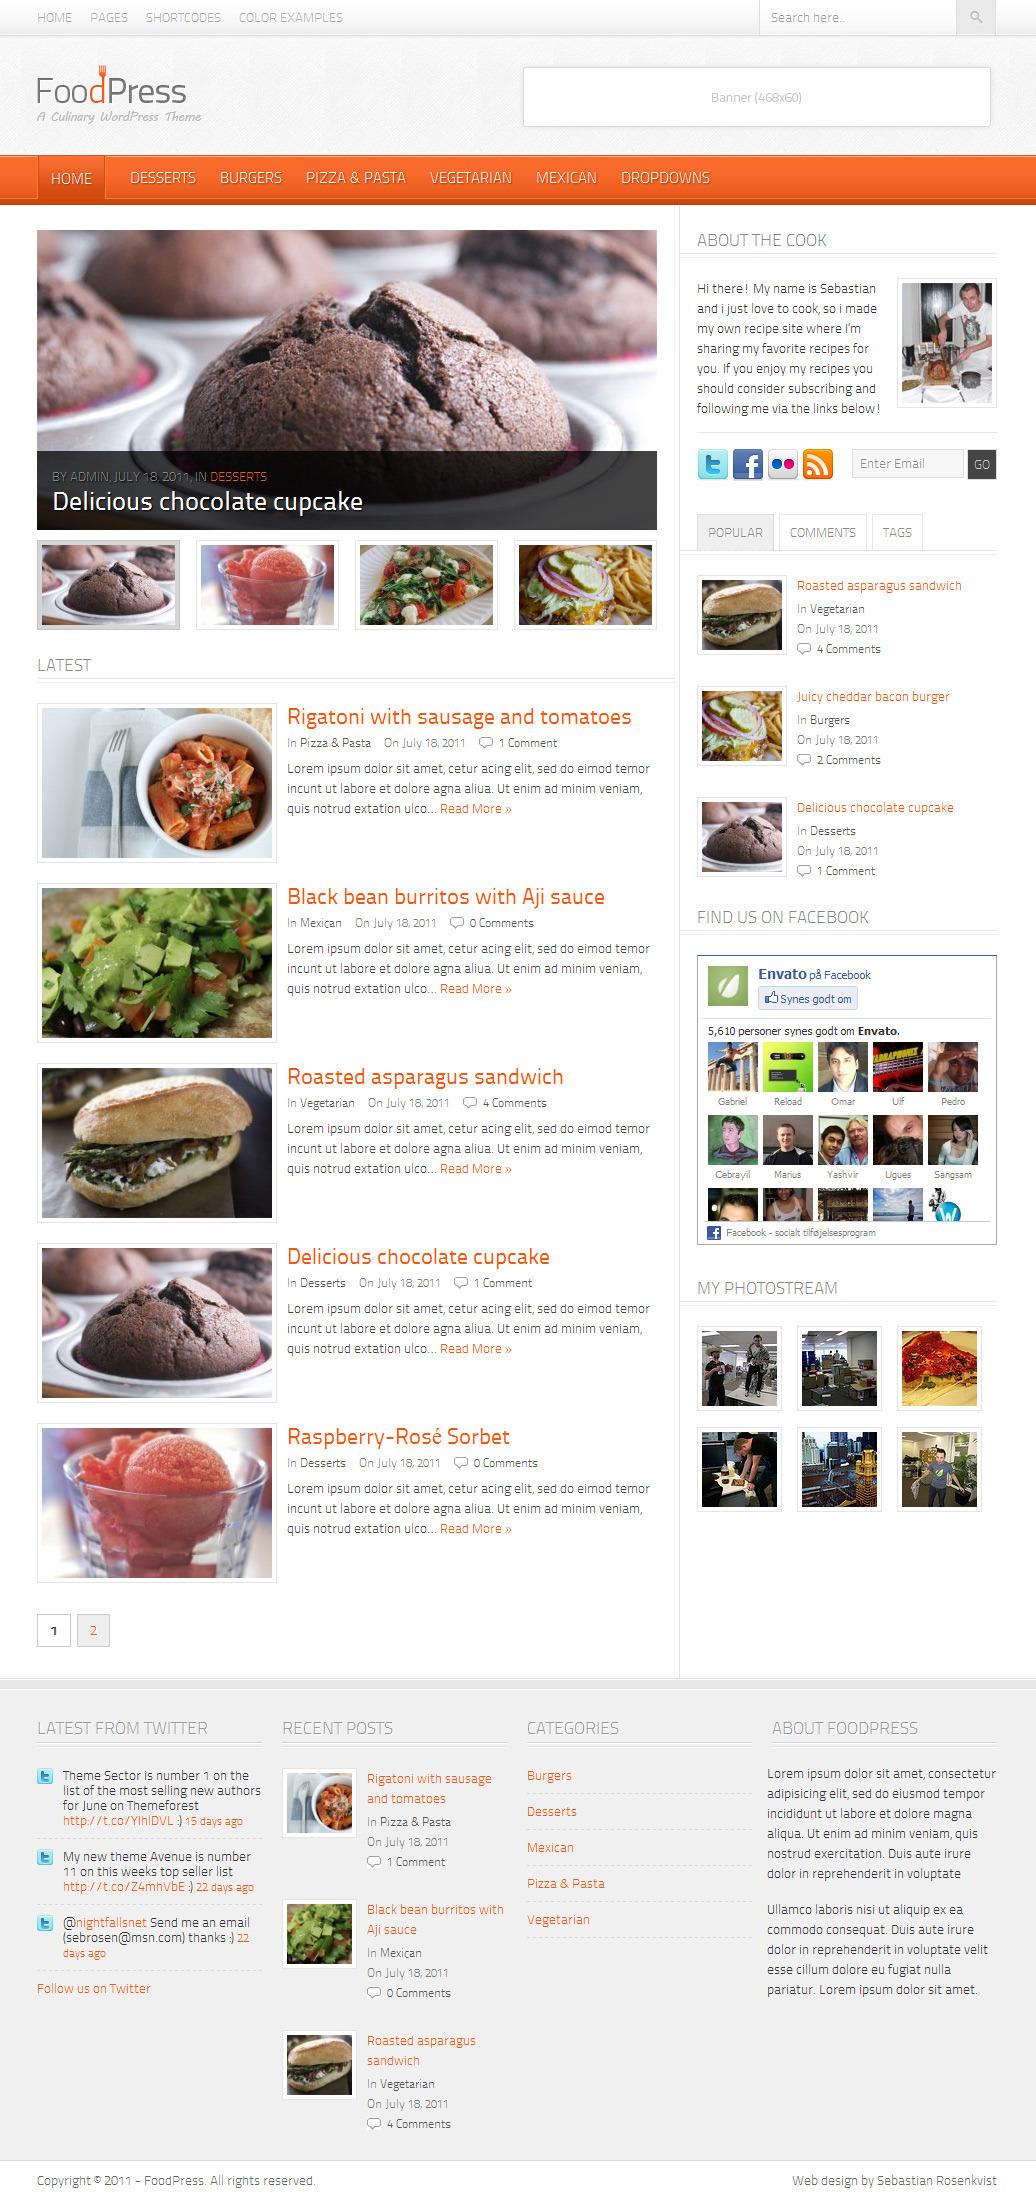 FoodPress - A Recipe & Food Blog WordPress Theme